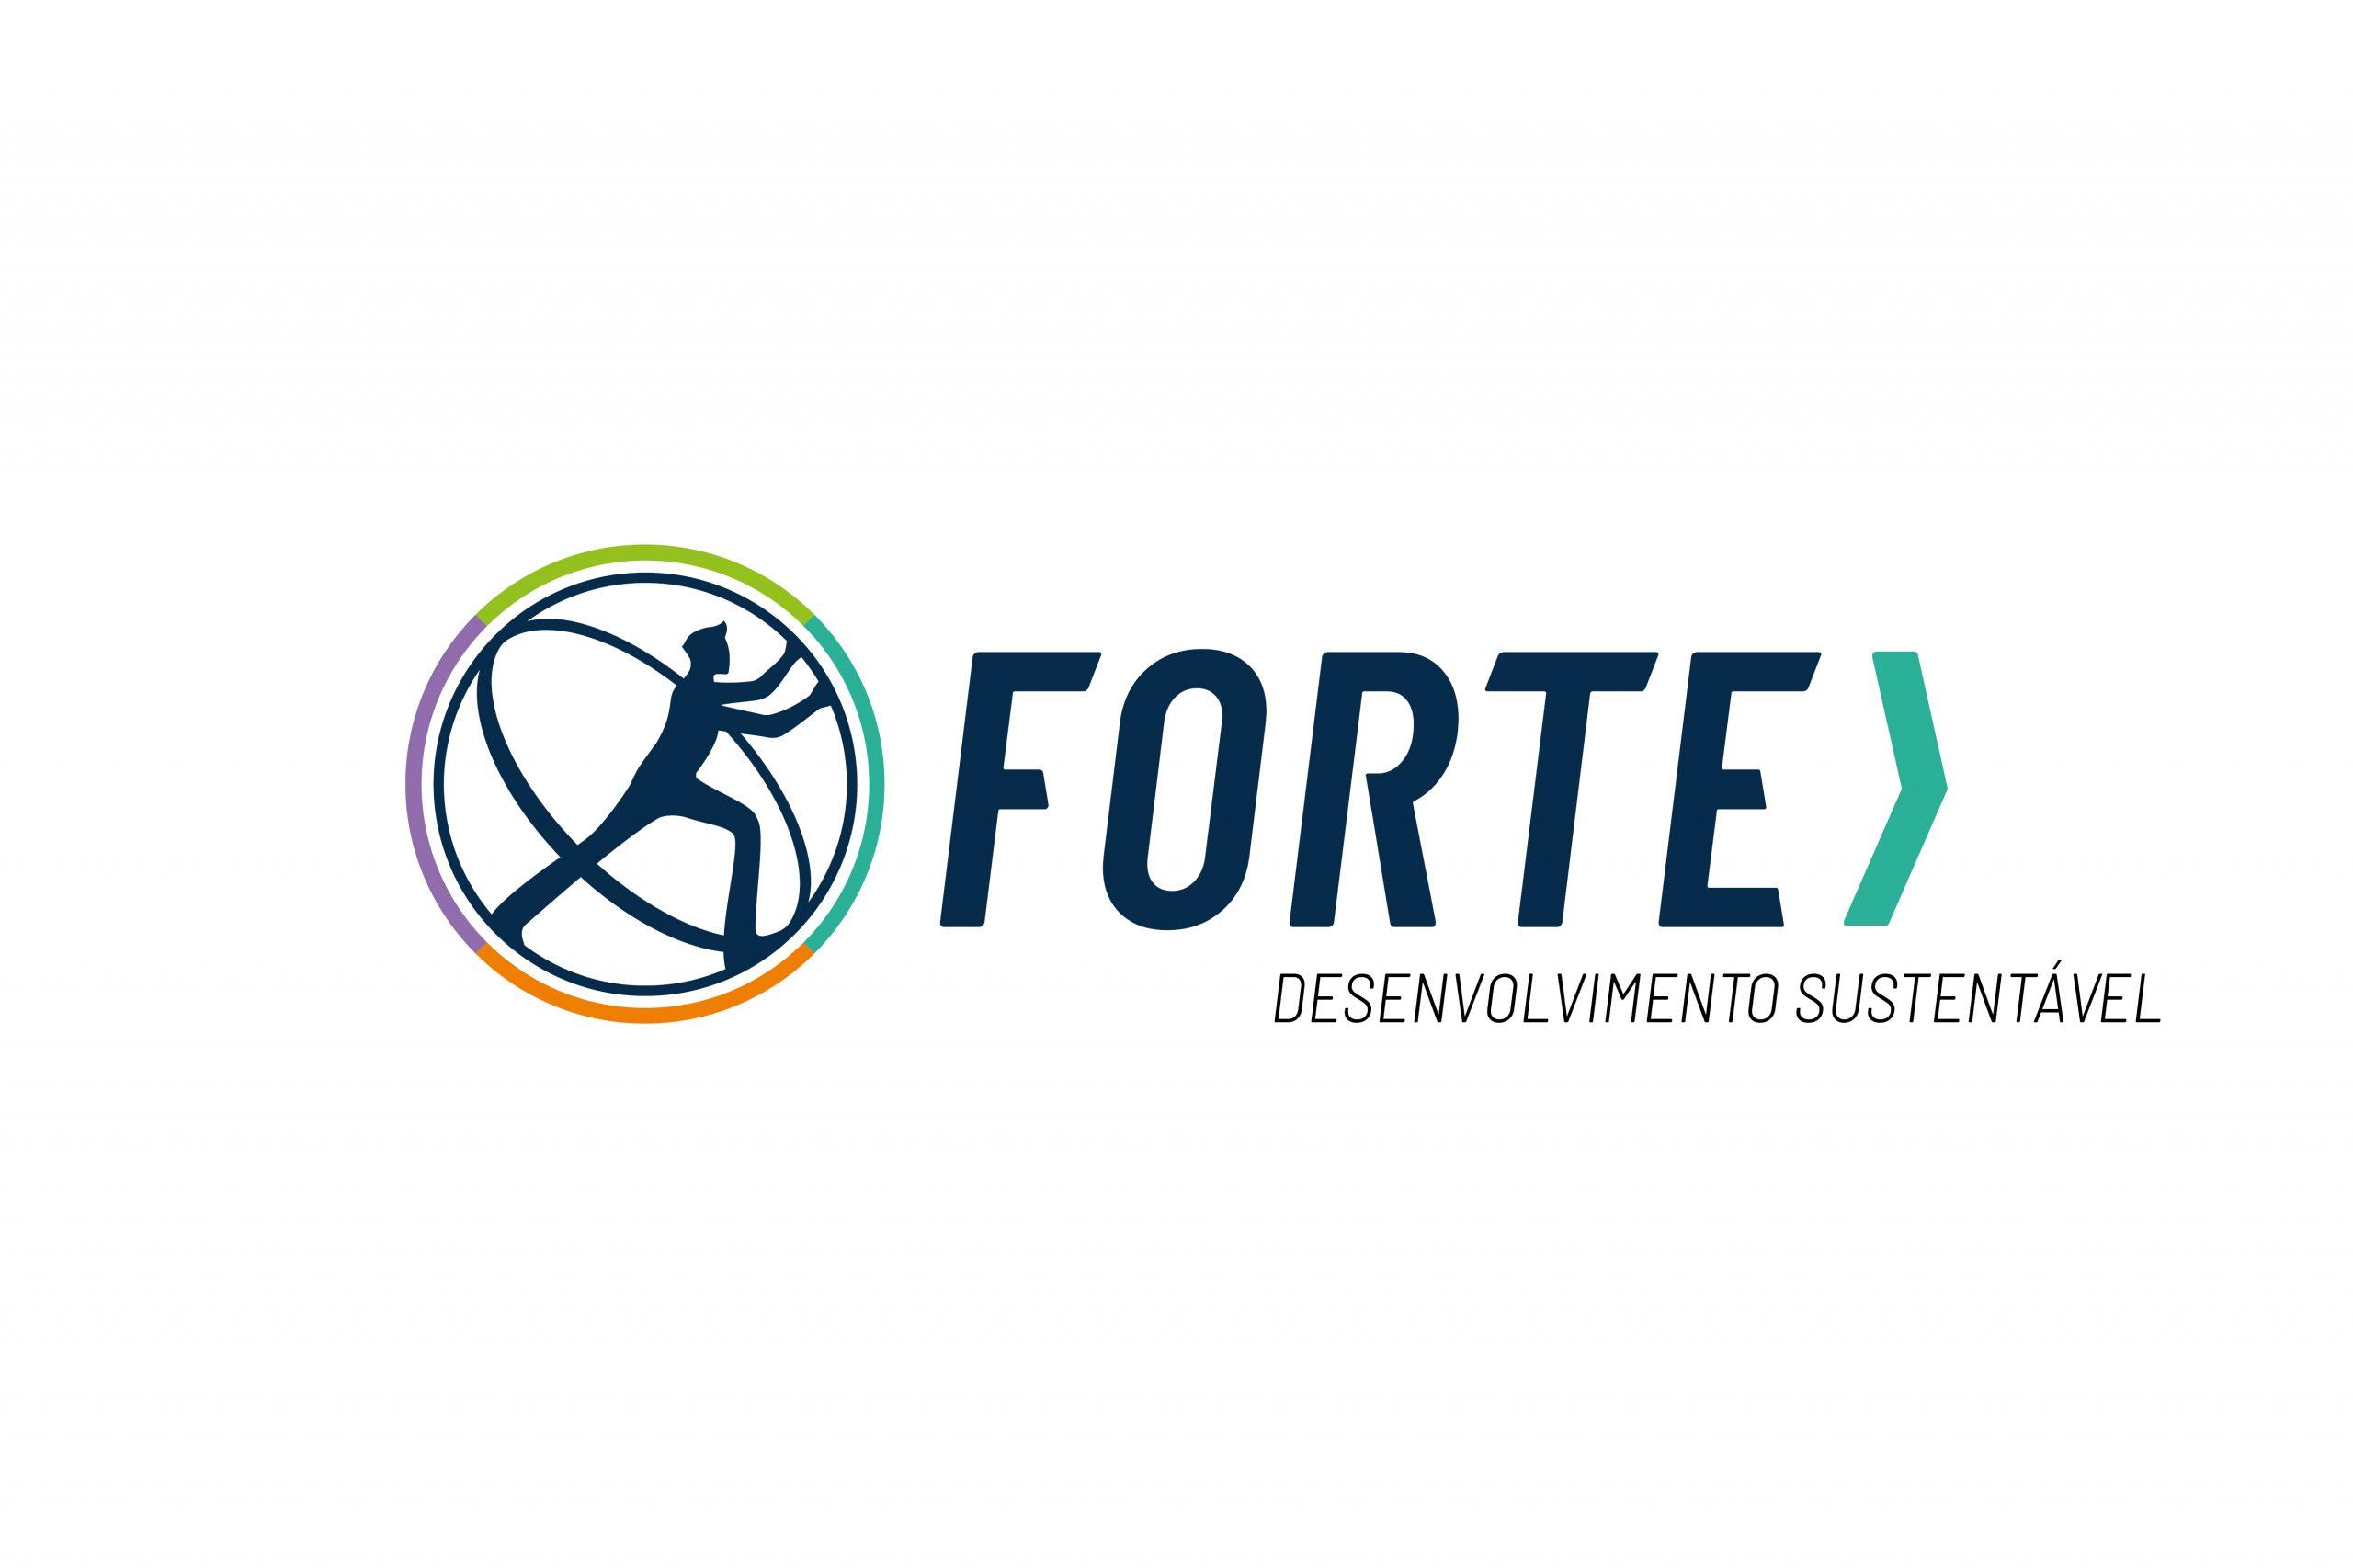 Forte_siteLumen12